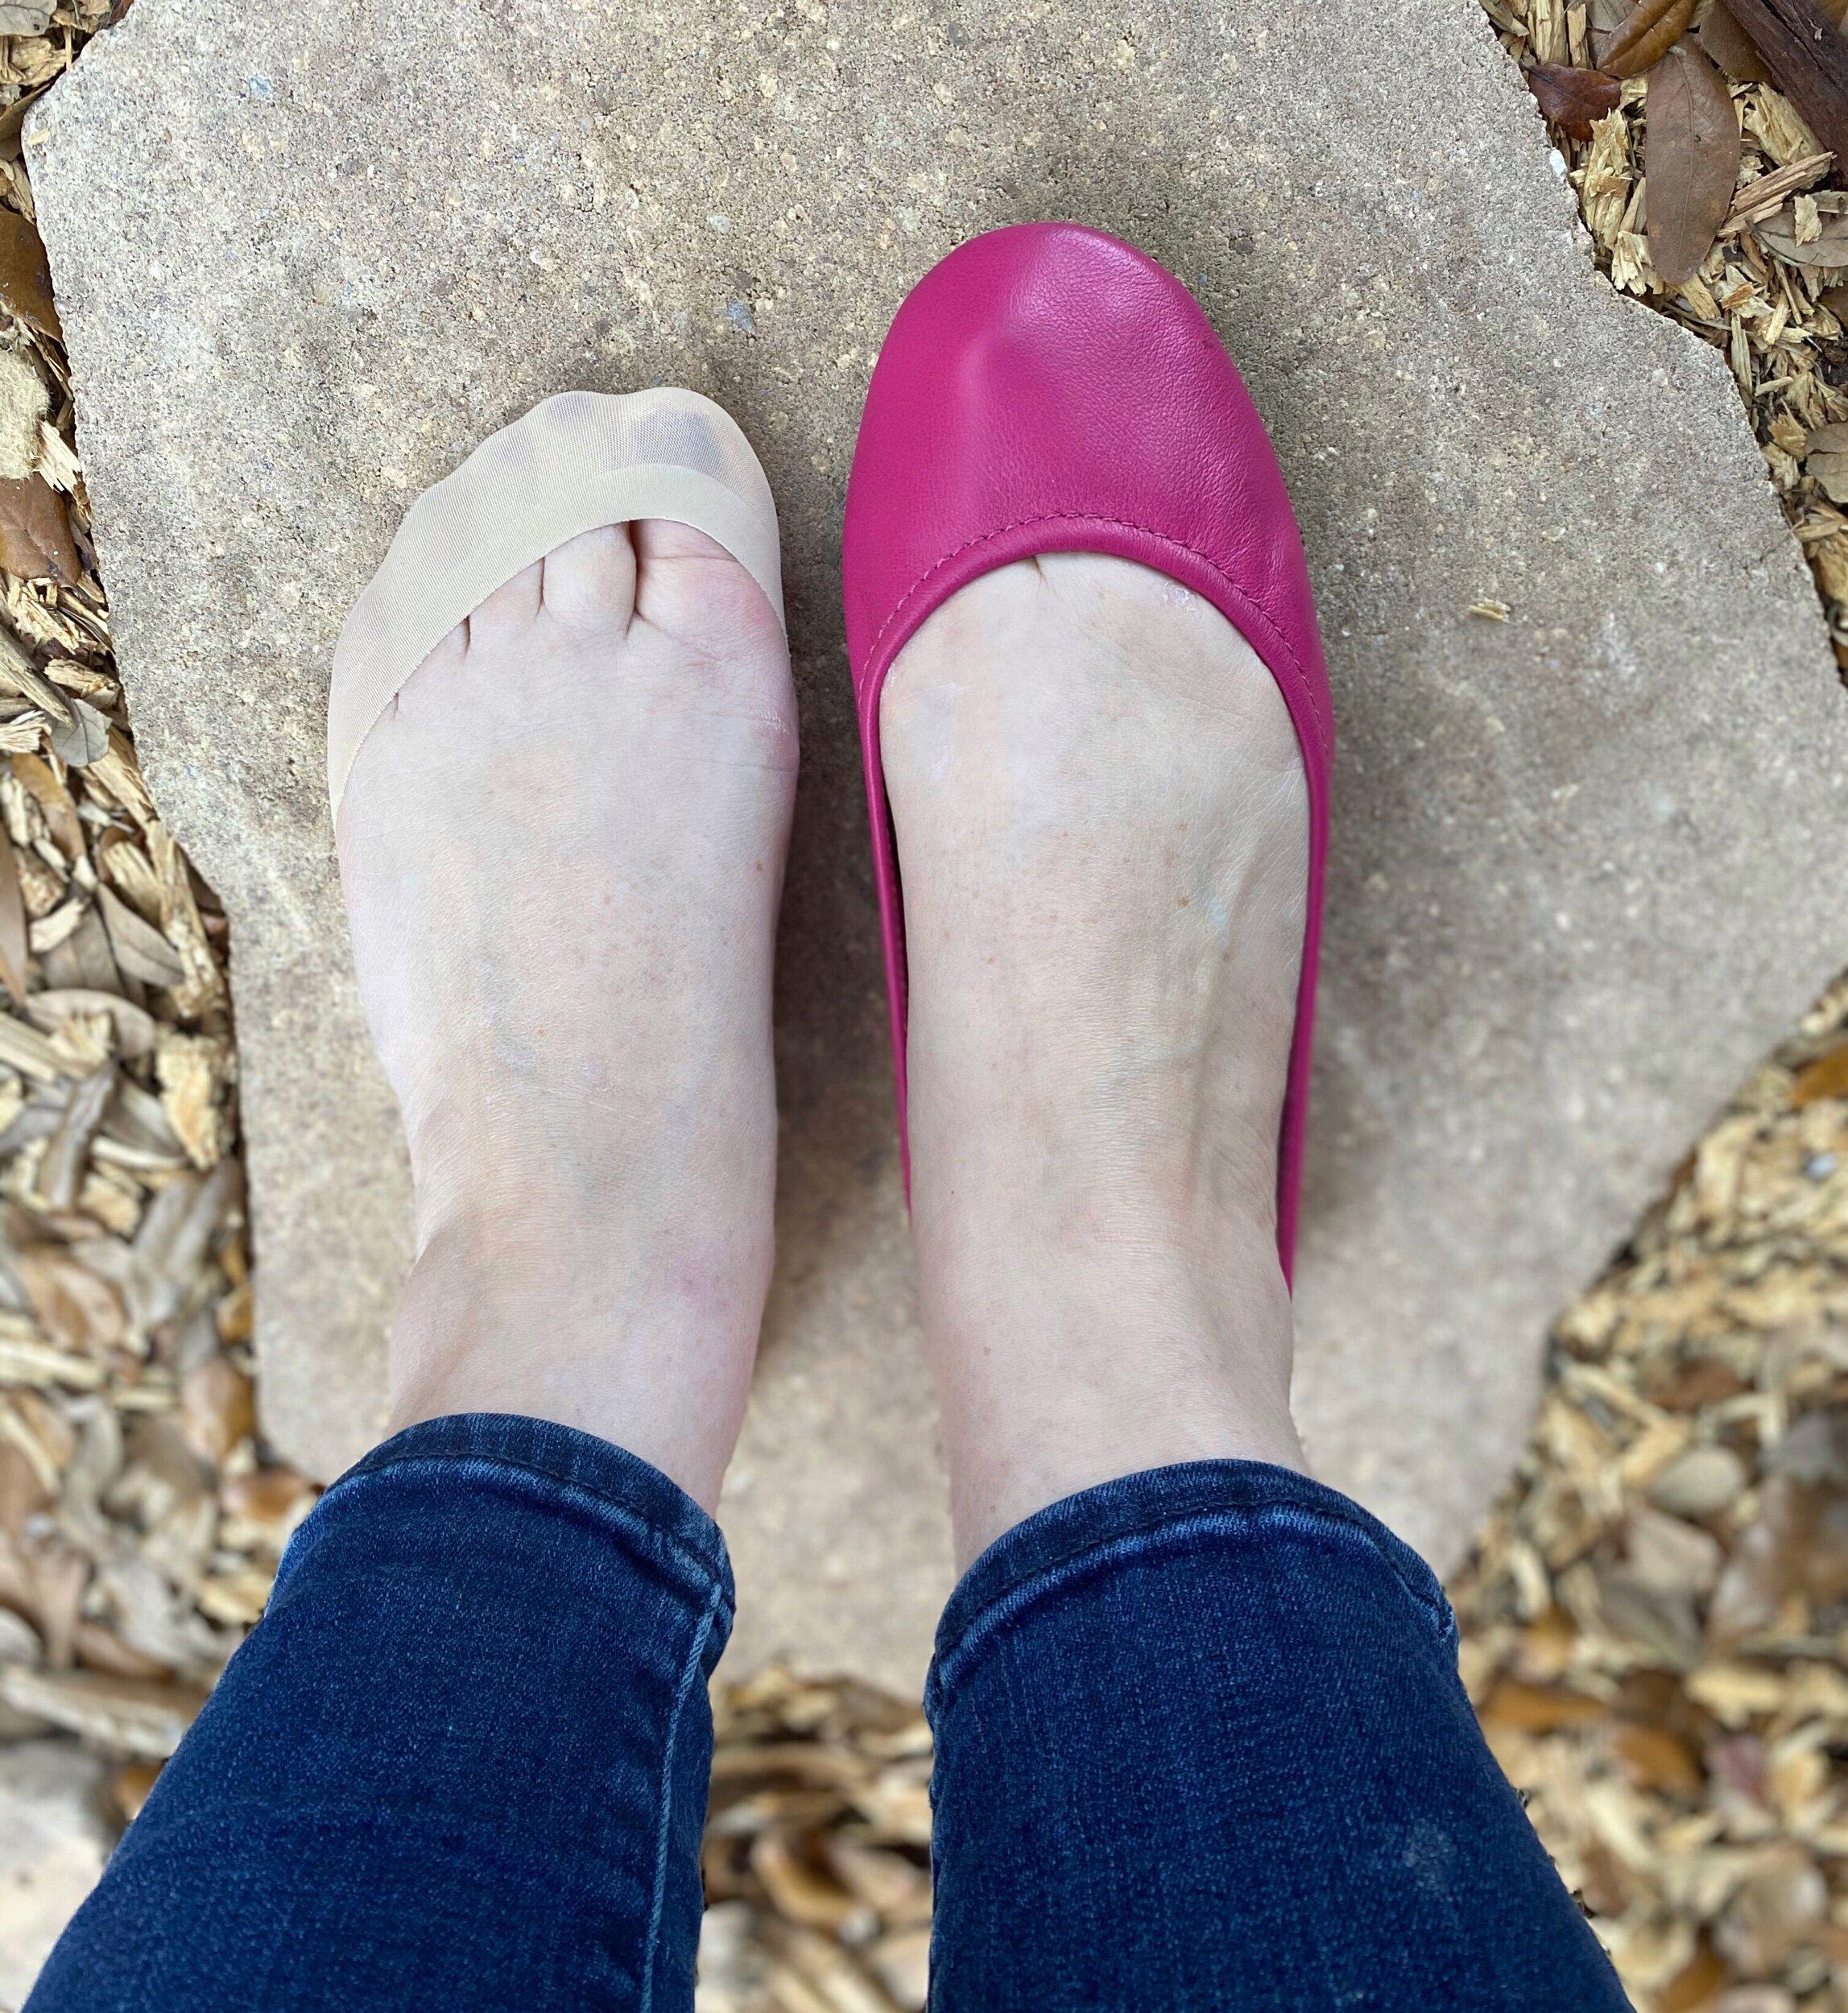 Show Socks for Tieks